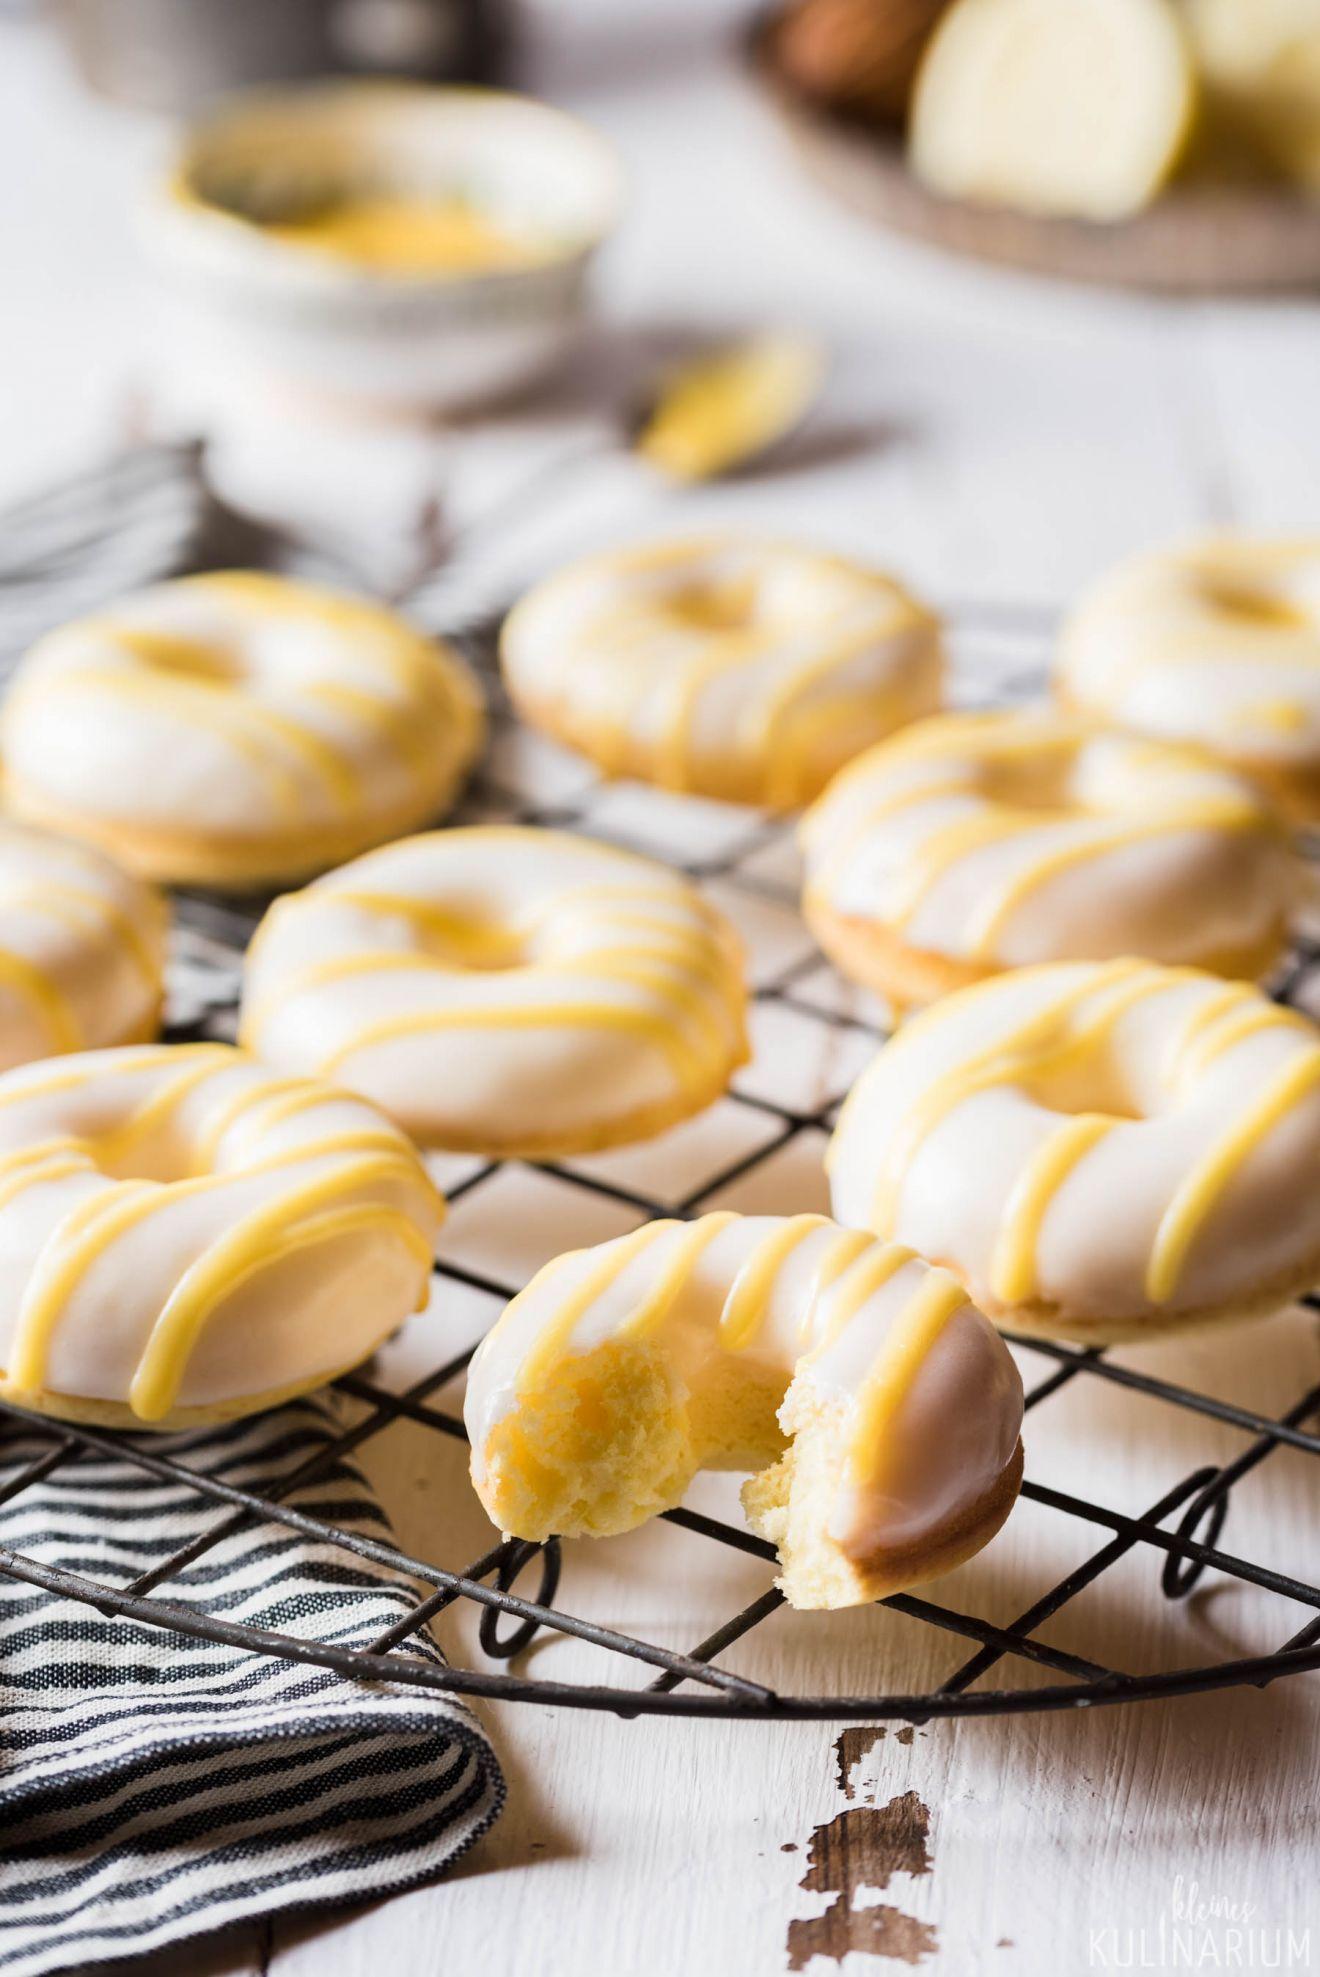 zitronen donut aus dem backofen rezept backen pinterest. Black Bedroom Furniture Sets. Home Design Ideas